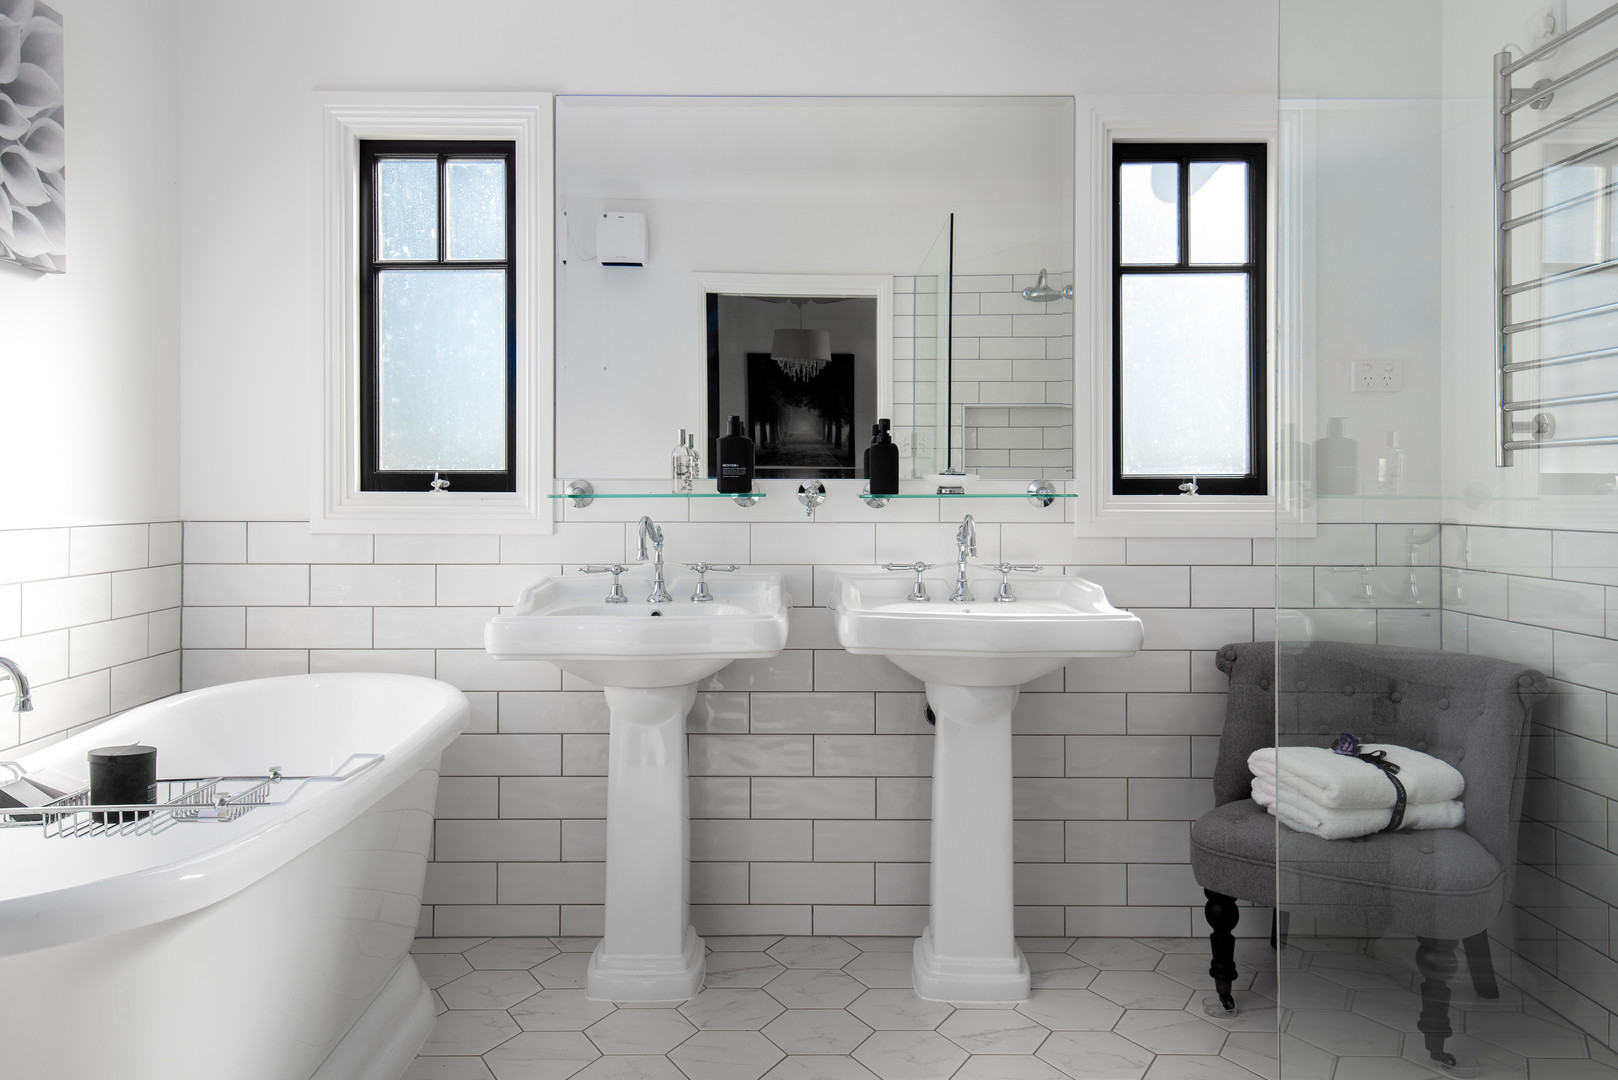 Herman-House-Kalbar-32.jpg